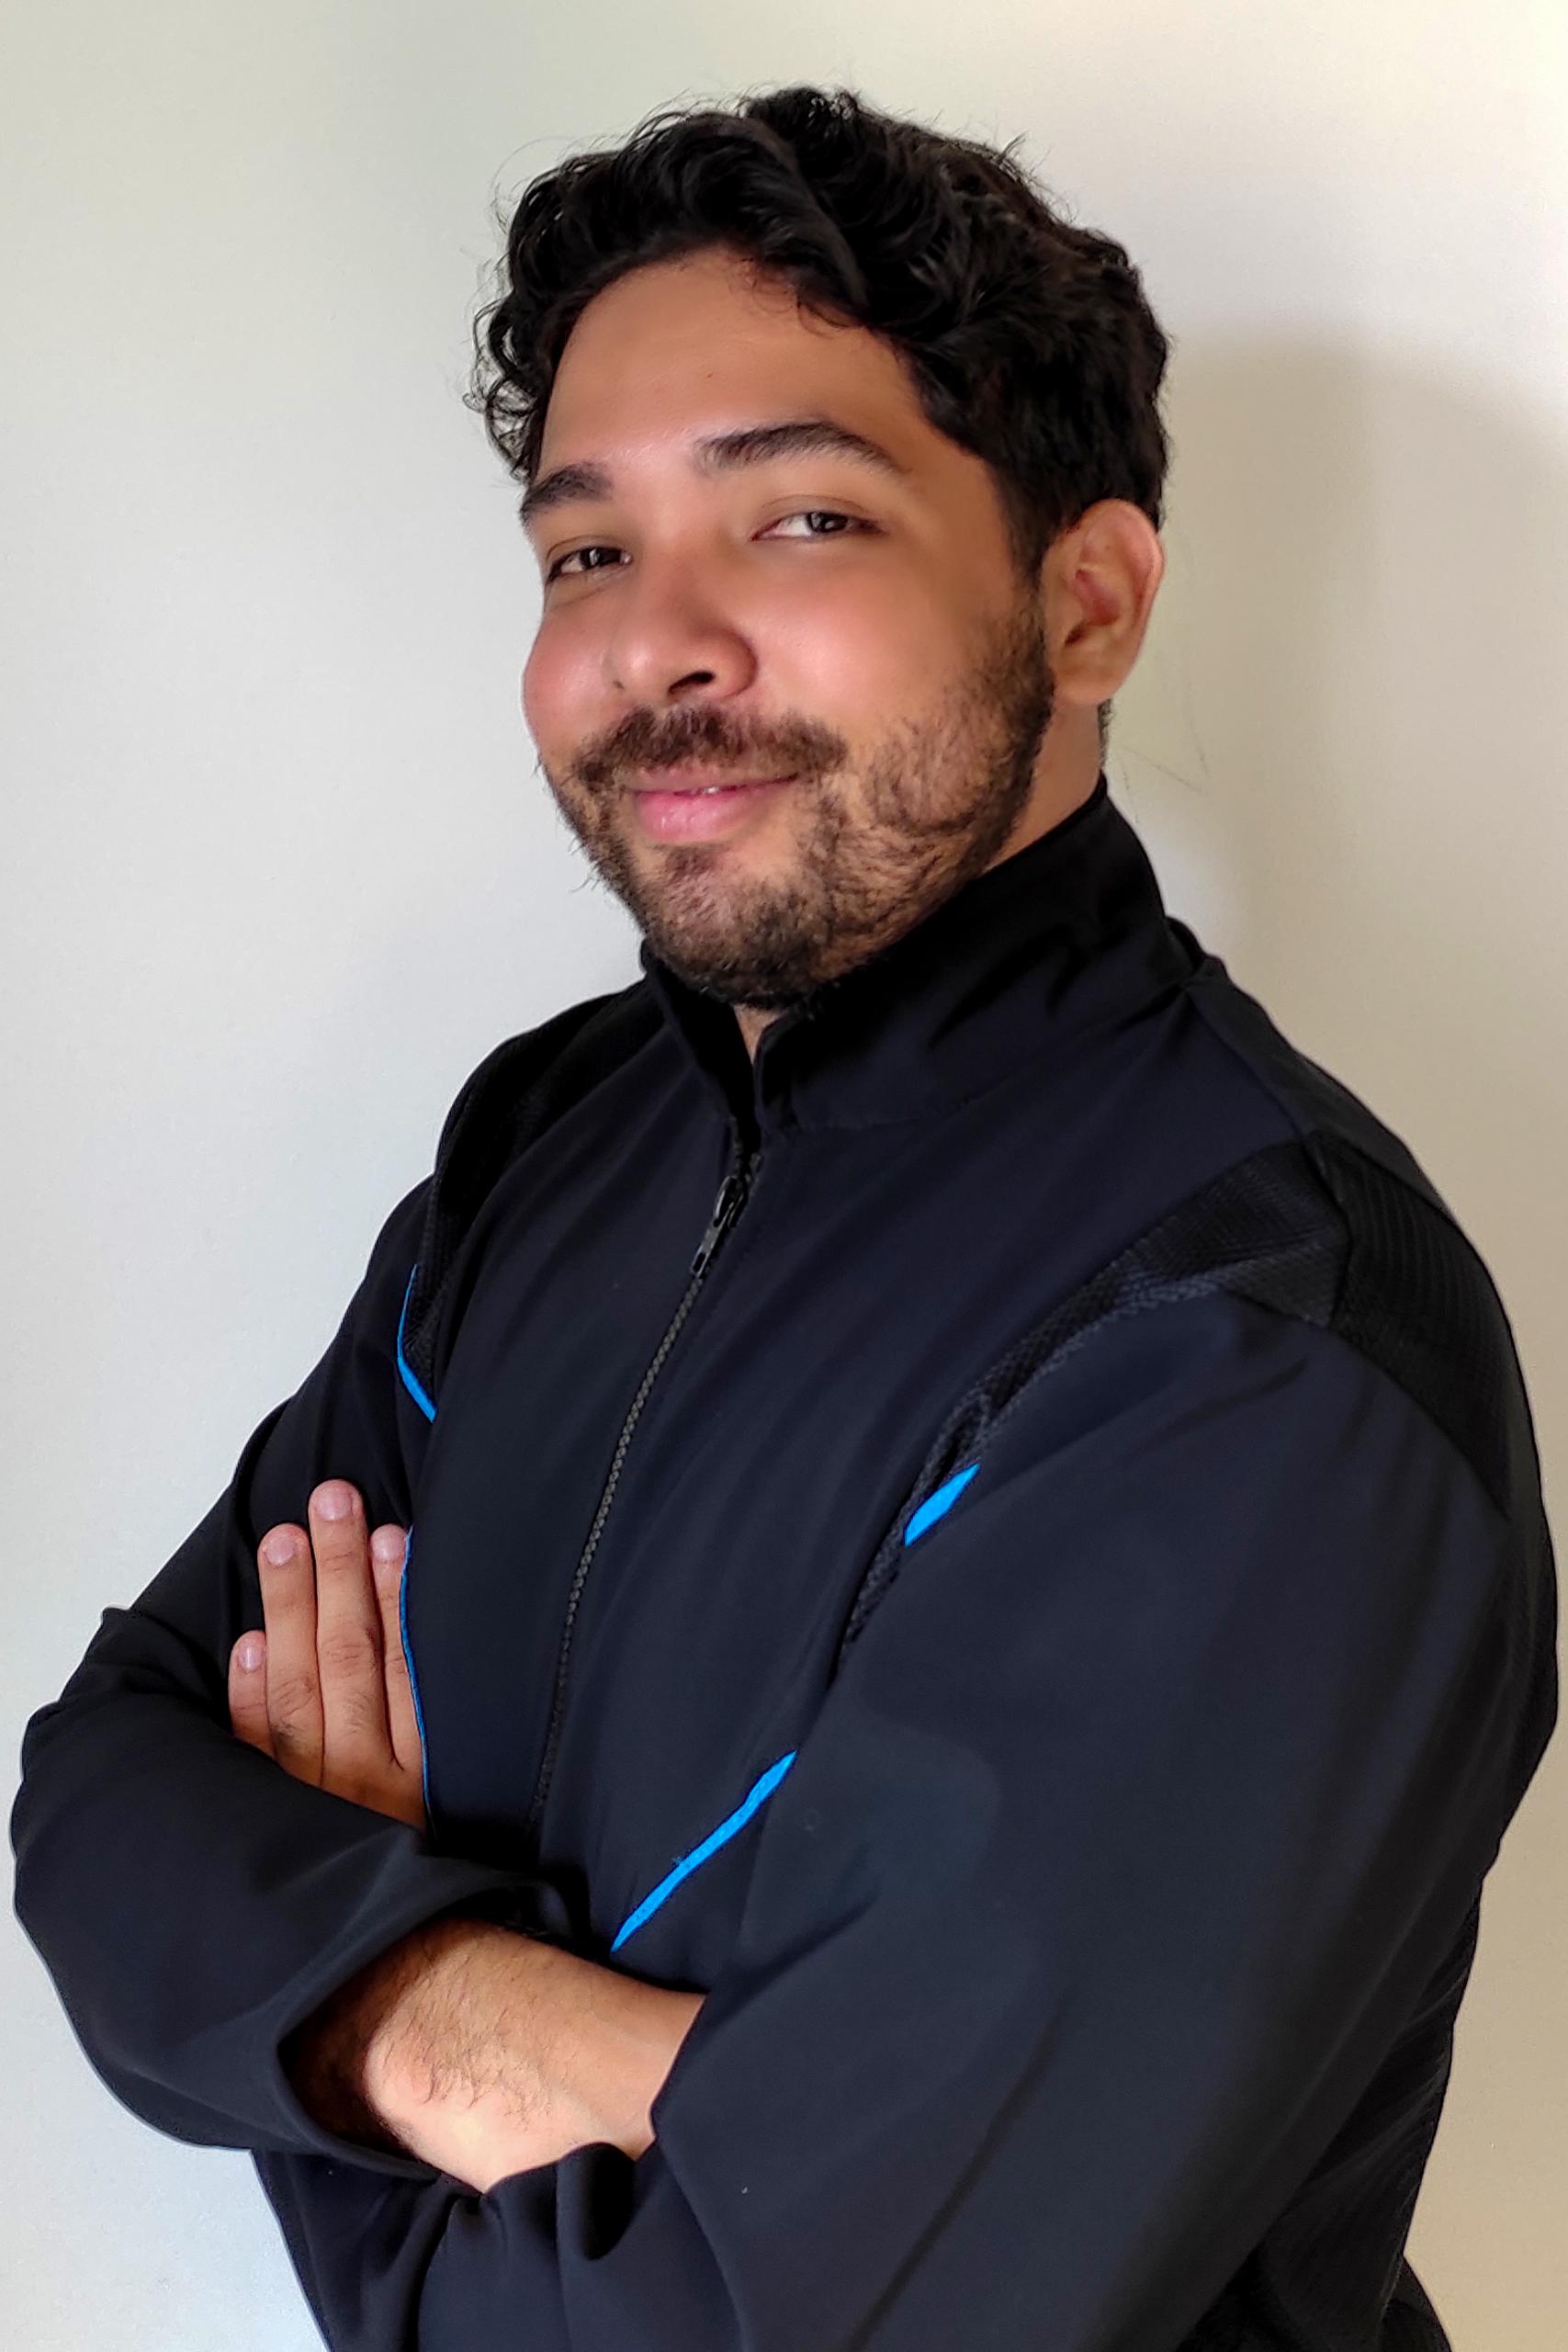 Isaac Quintero